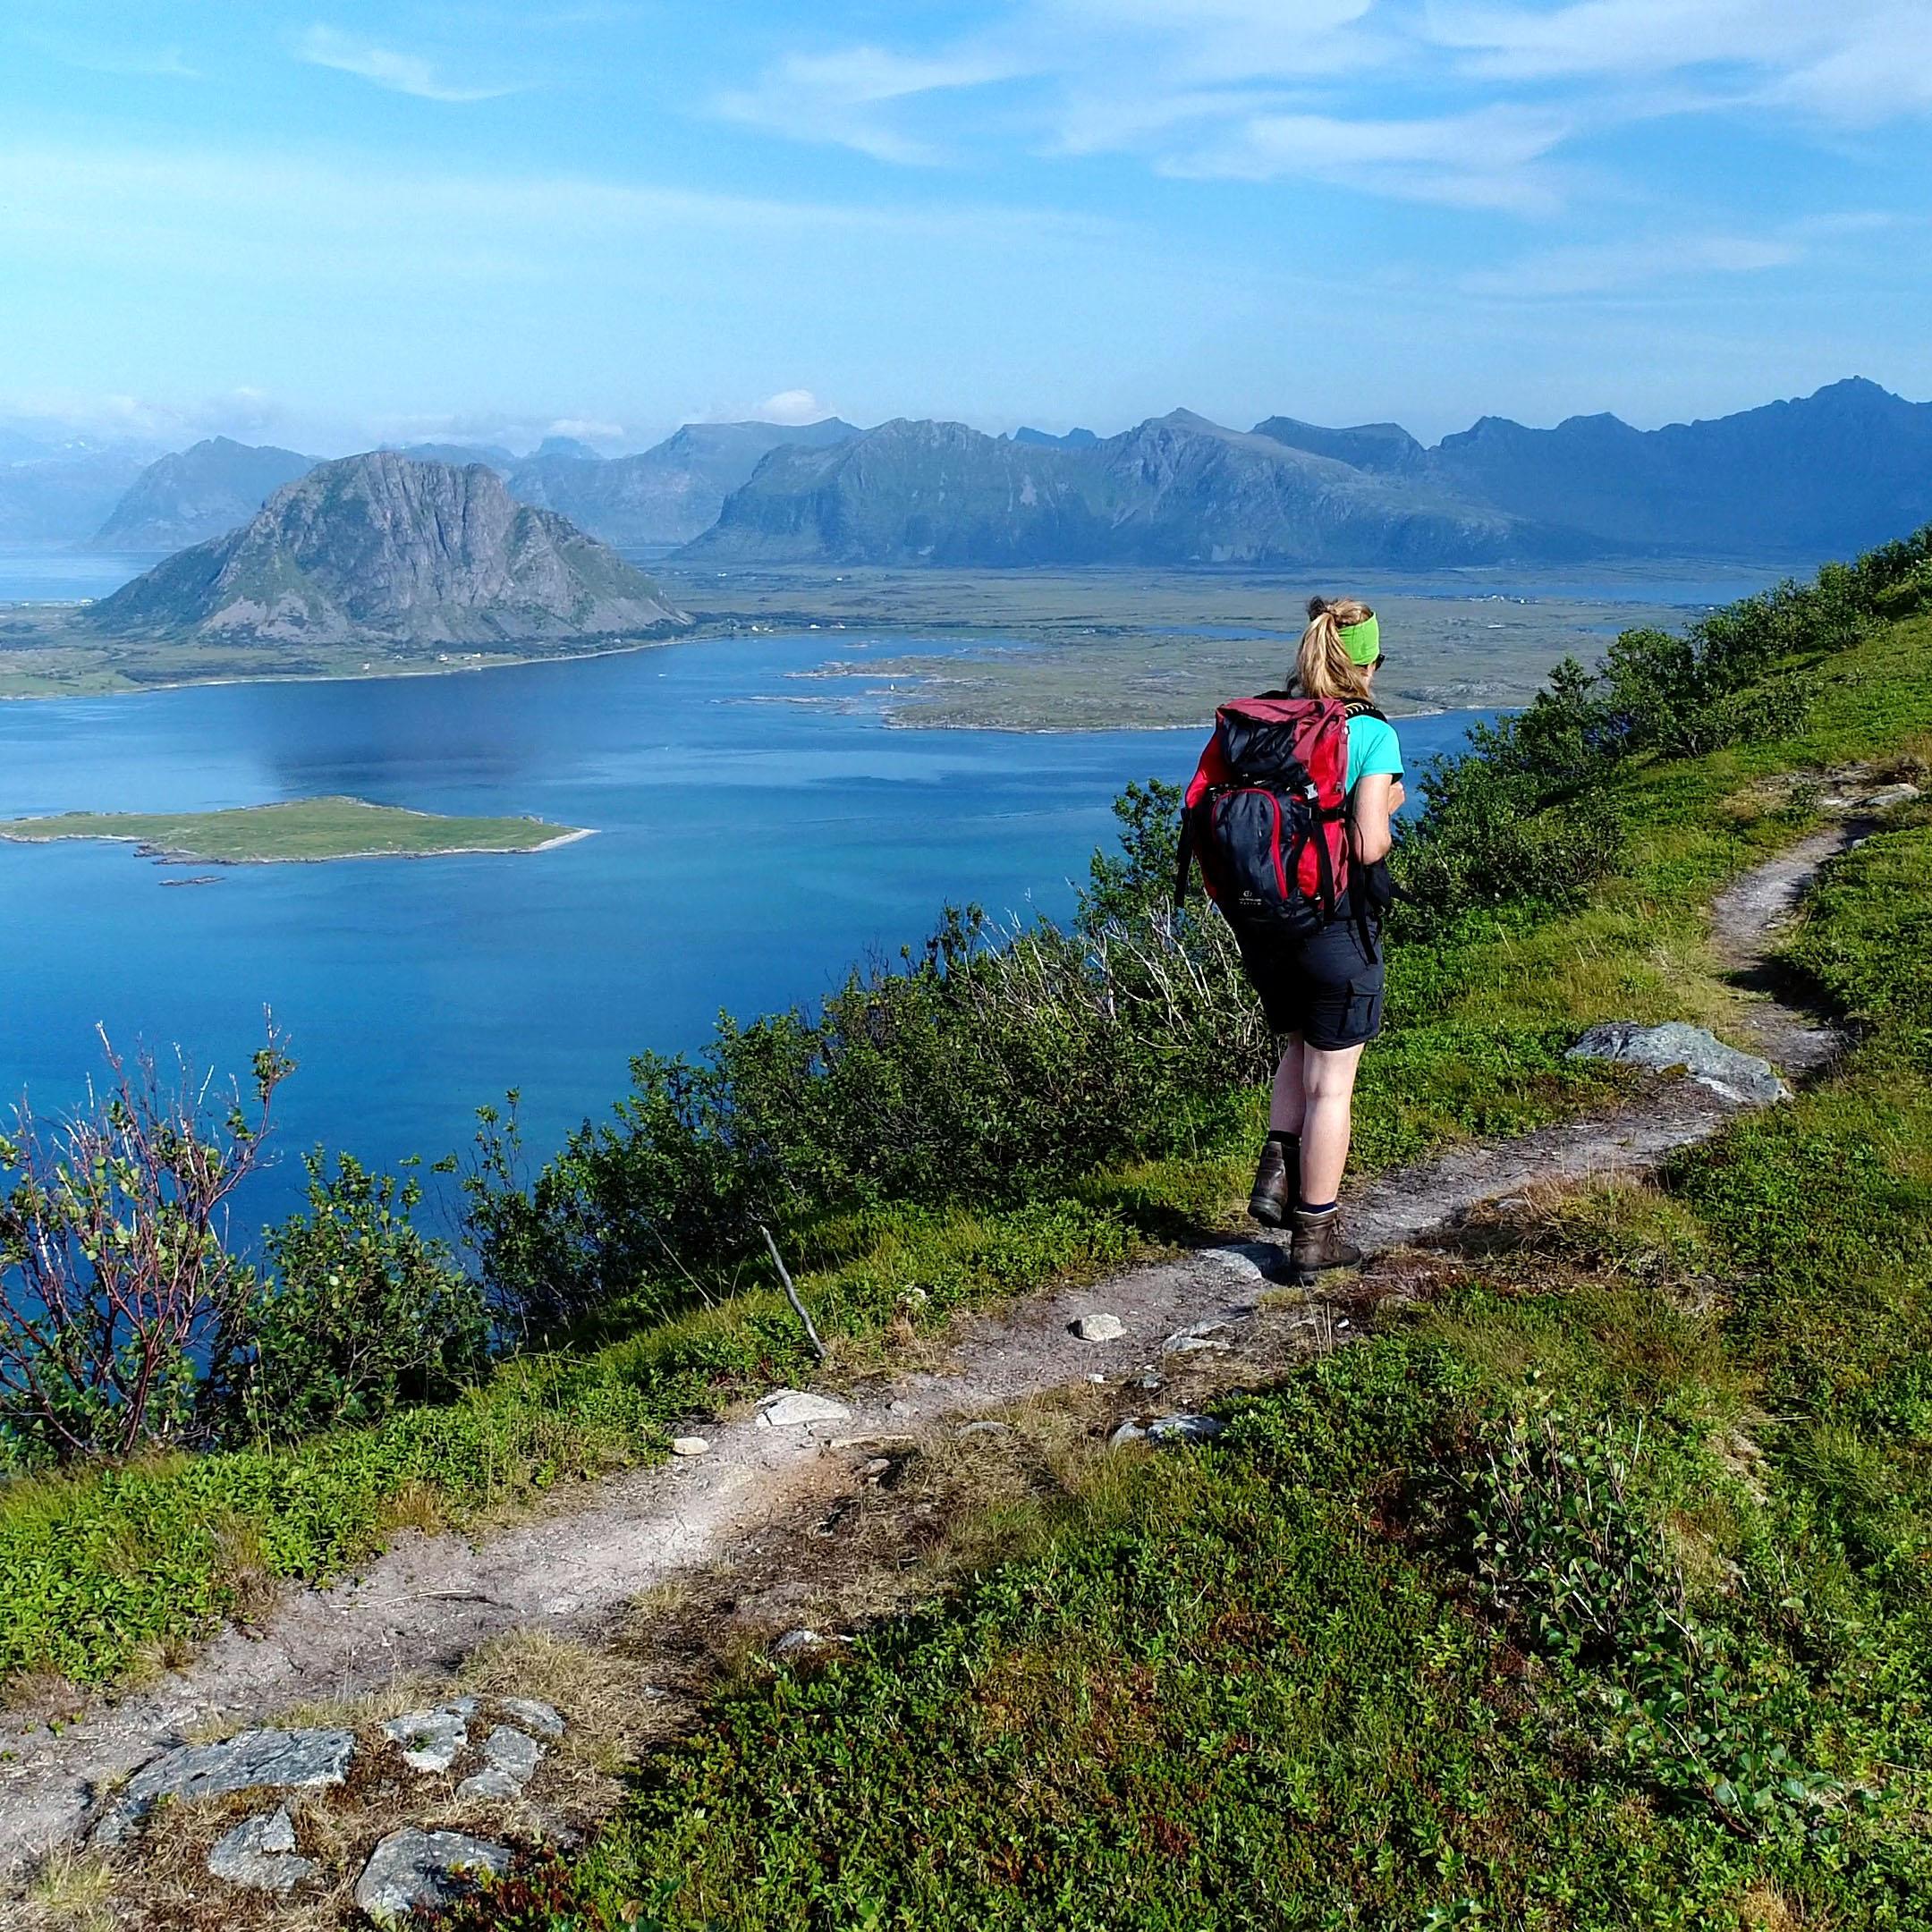 RANDO-LOFOTEN - Hiking to the summit of Middagstinden